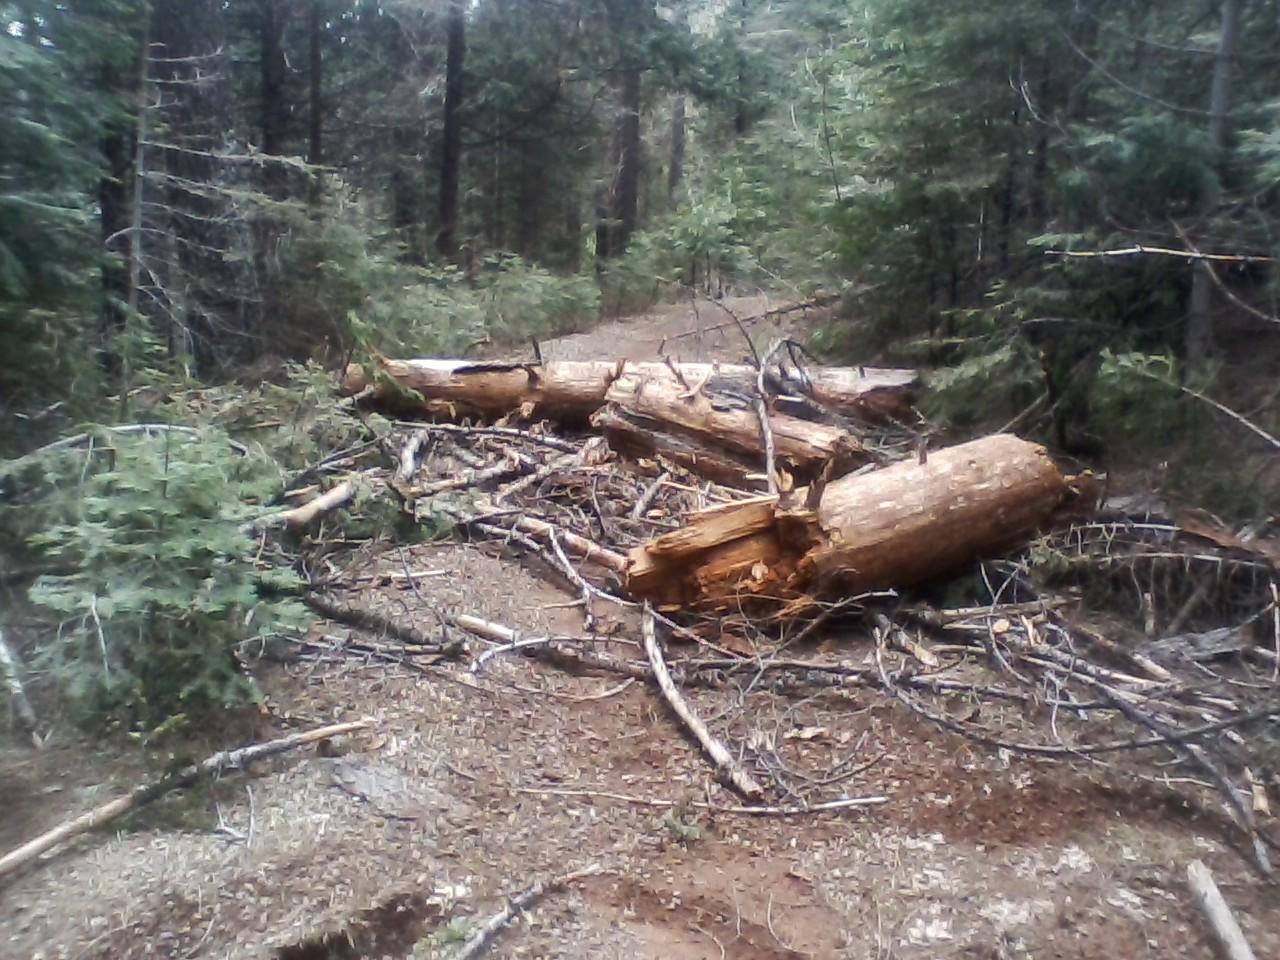 miami trail work.jpg